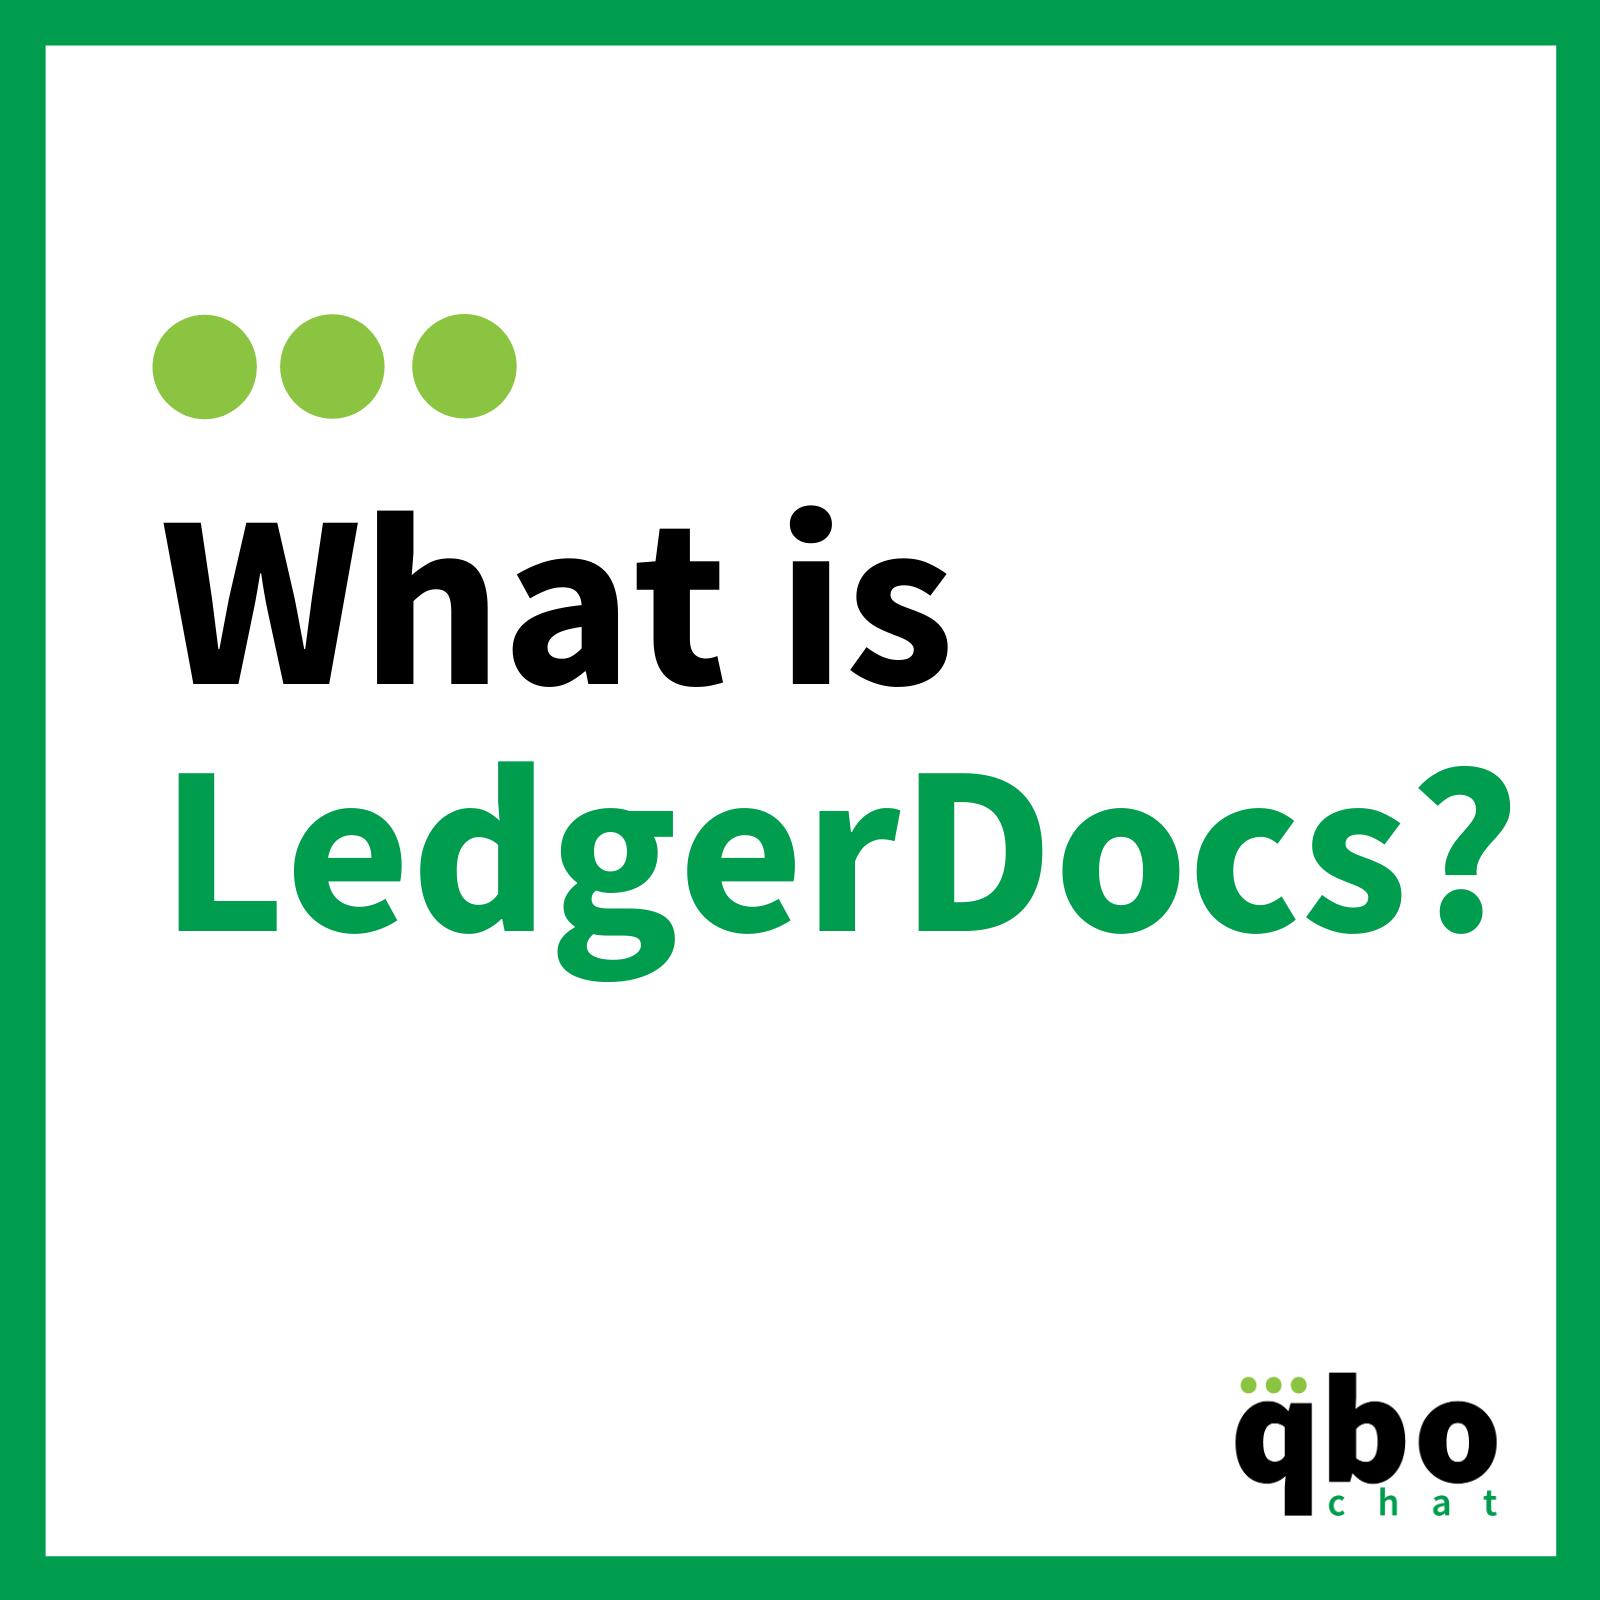 What is LedgerDocs?